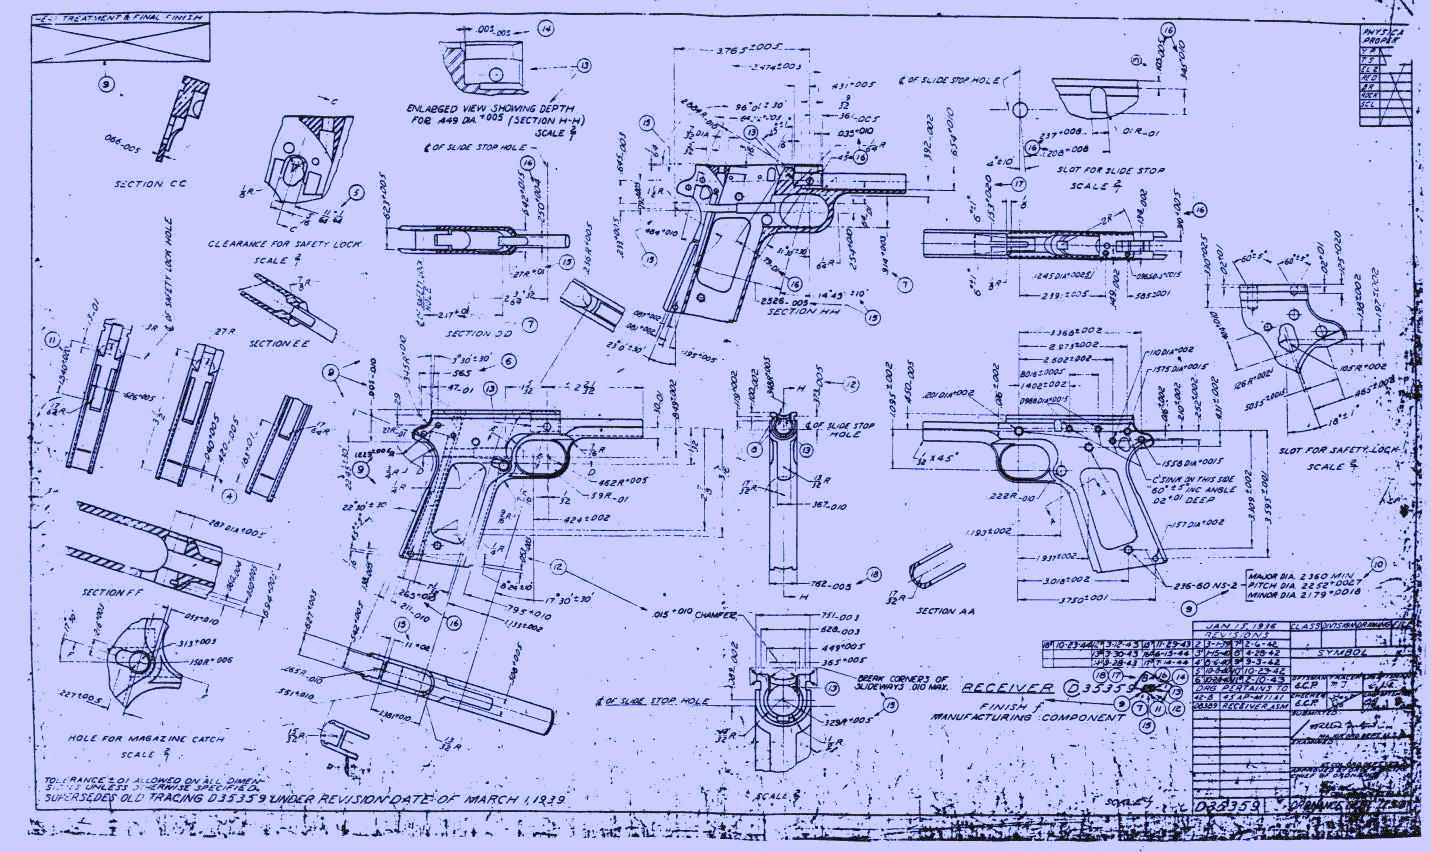 Drawn pistol blueprint Info/Construction /downloads/Gunsmithing and of 1911rec